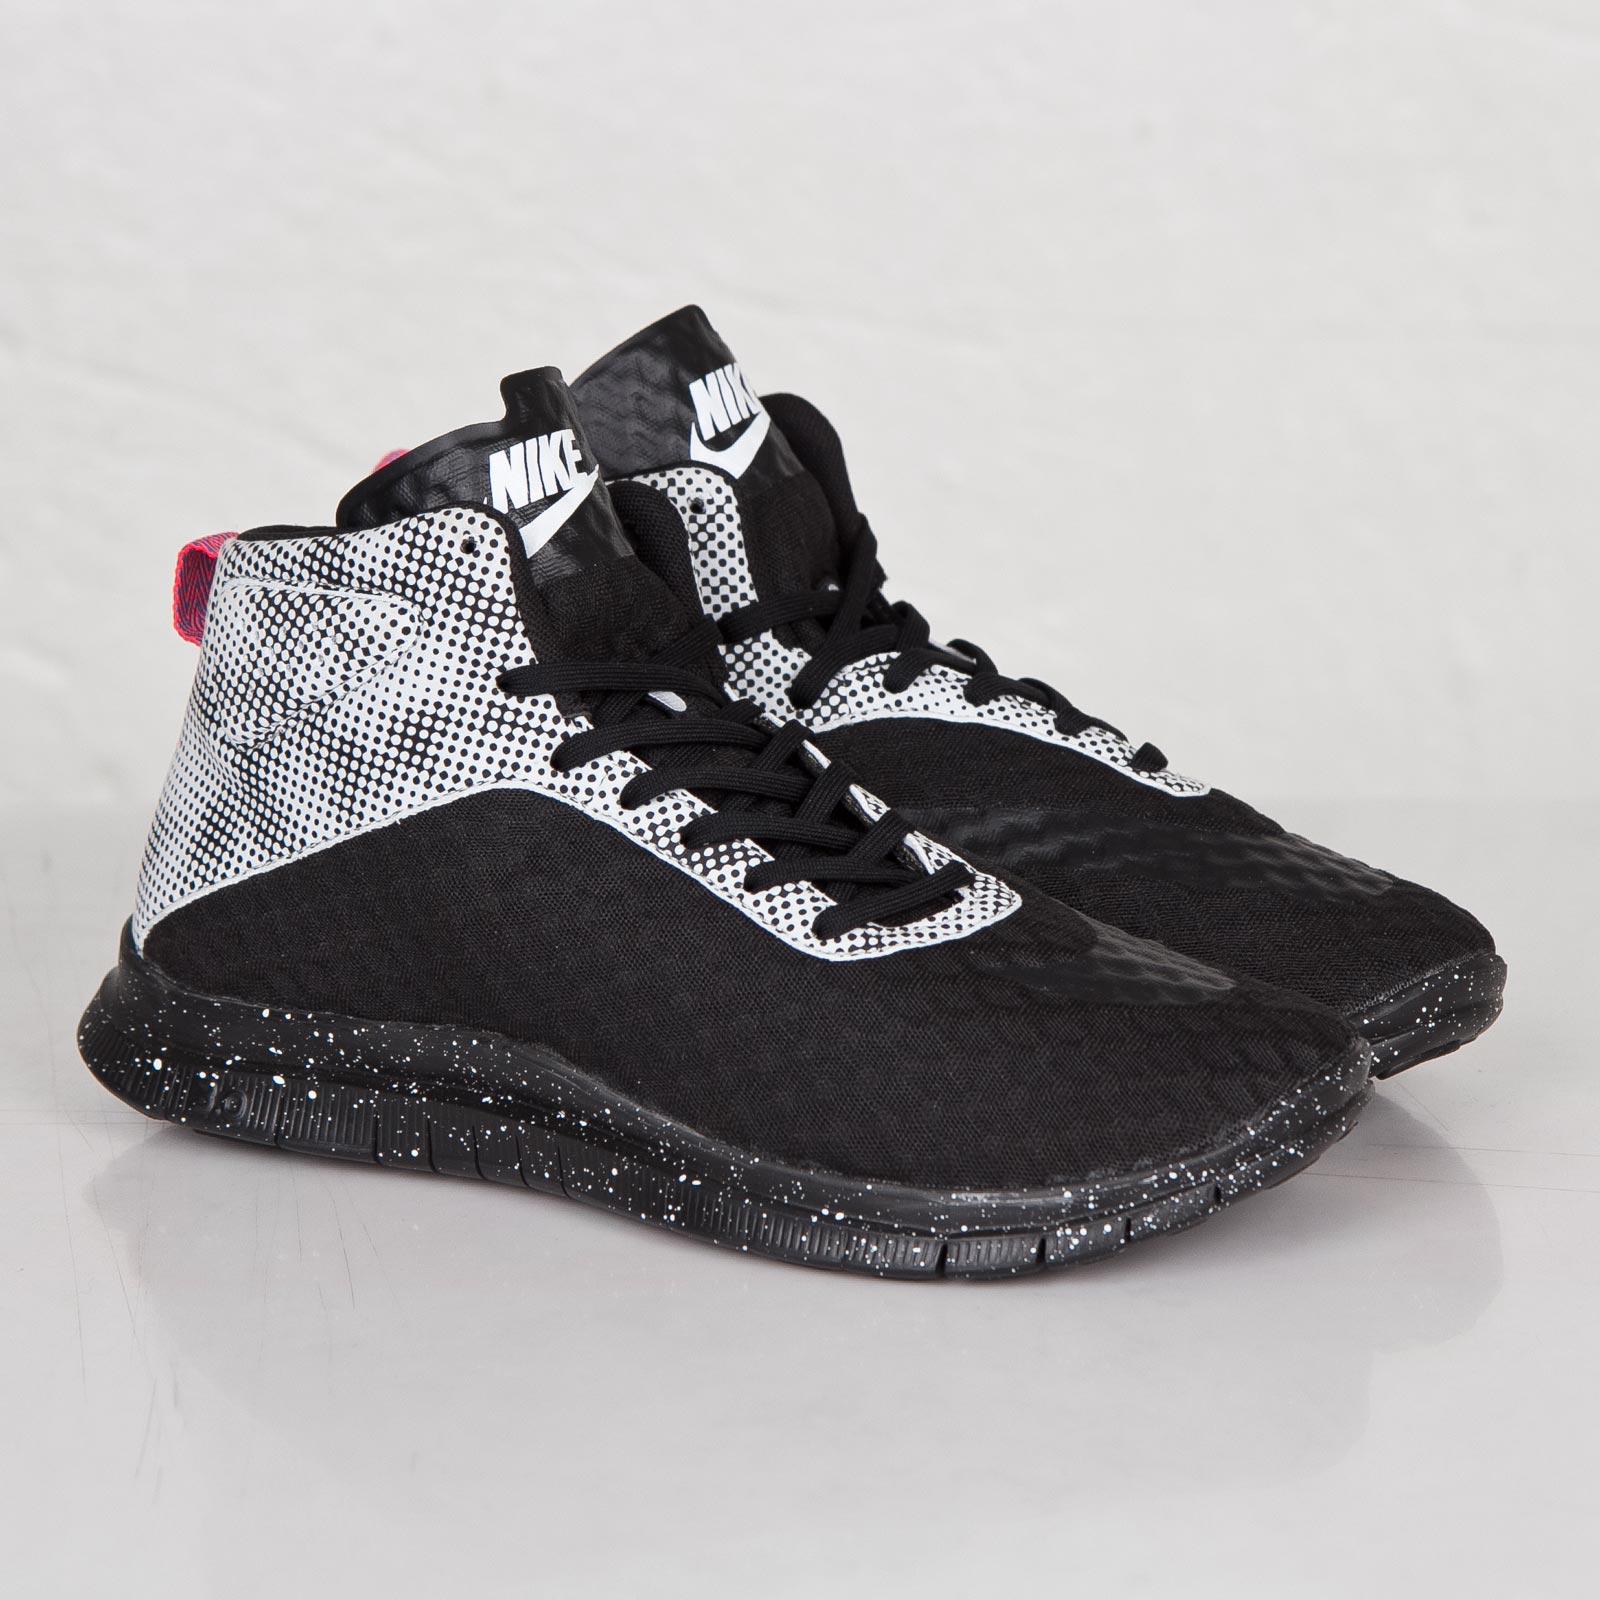 the latest 27185 47dfc Nike Free Hypervenom Mid QS - 706569-002 - Sneakersnstuff ...